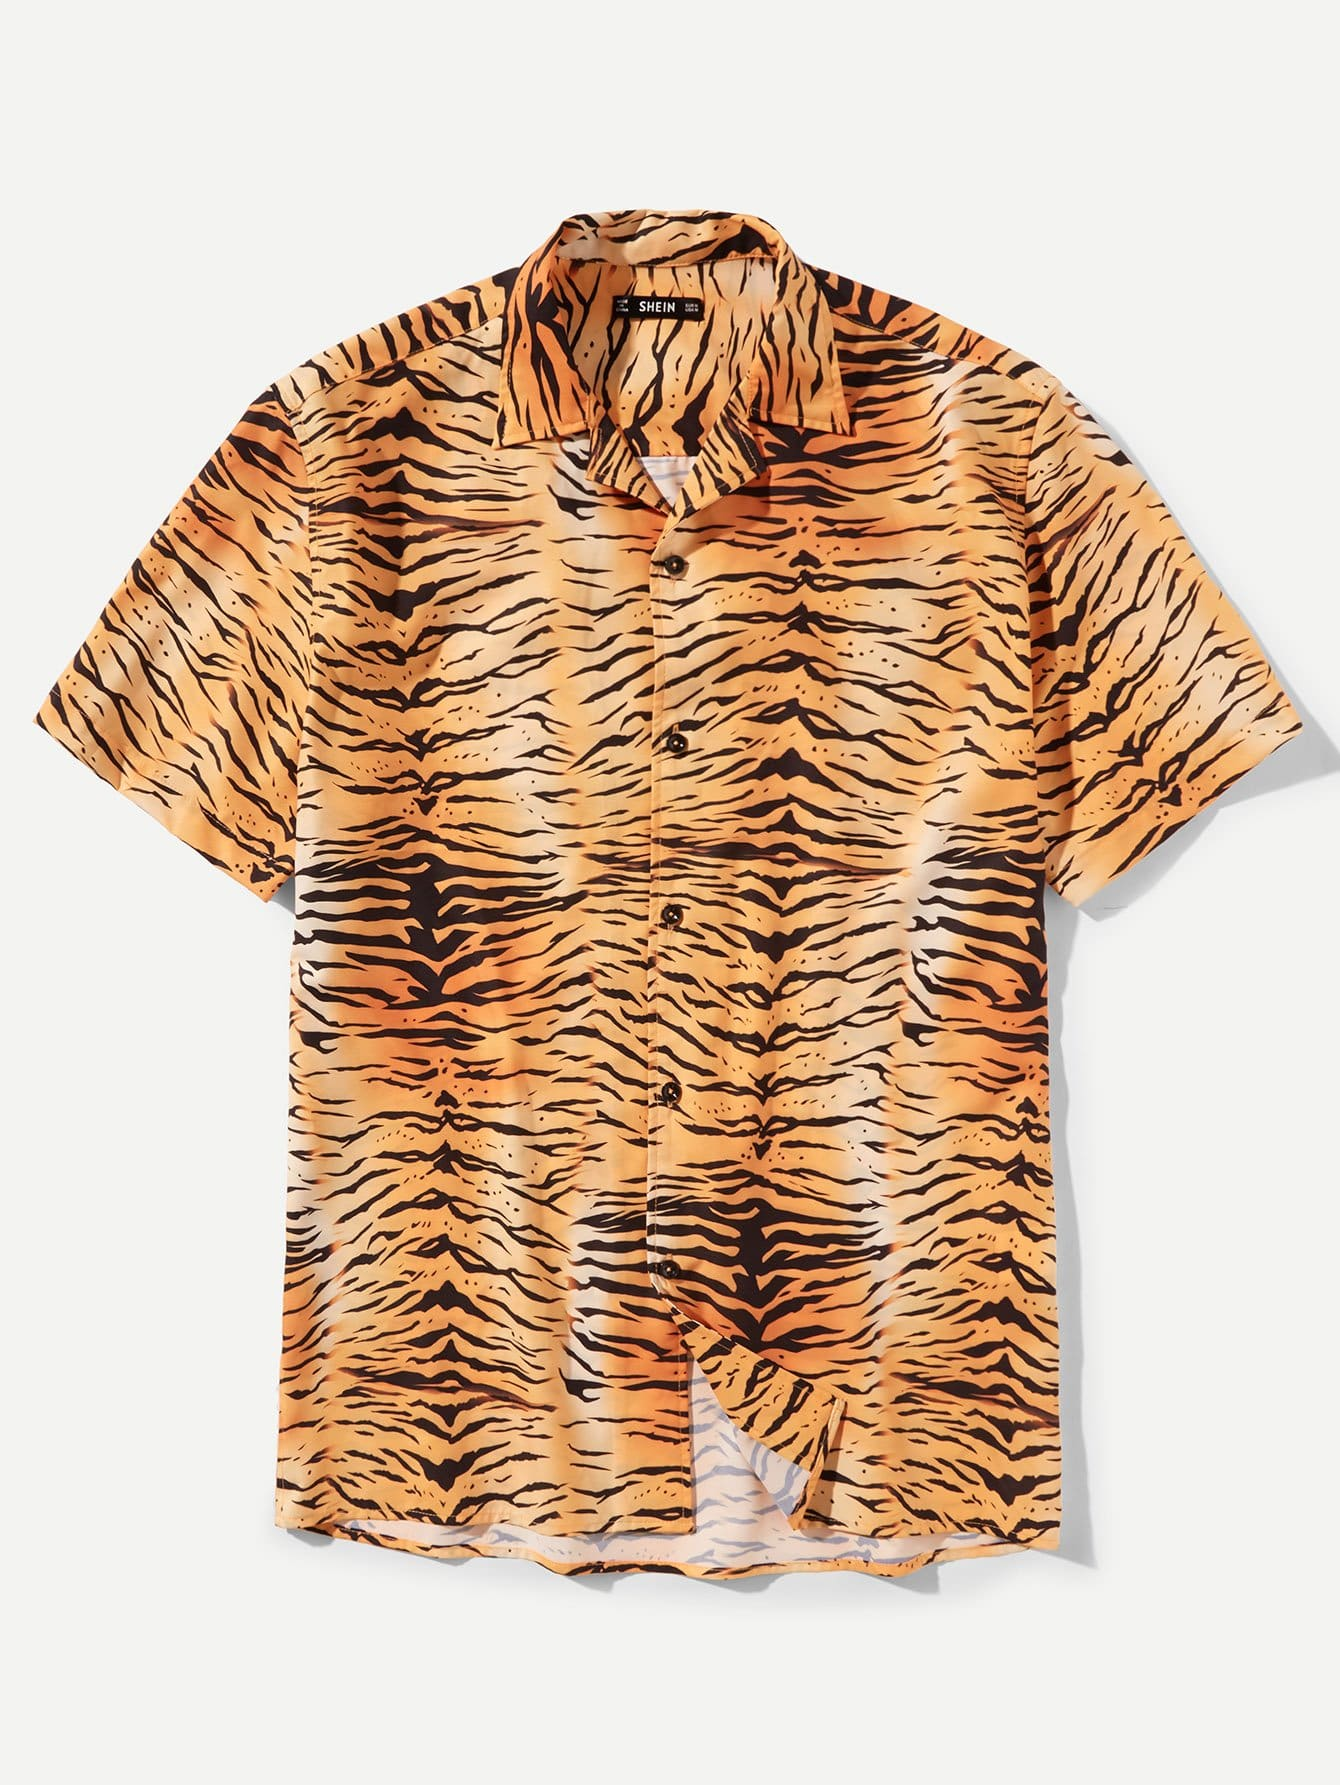 Купить Футболка с рисунком тигра и с короткими рукавами для мужчины, null, SheIn